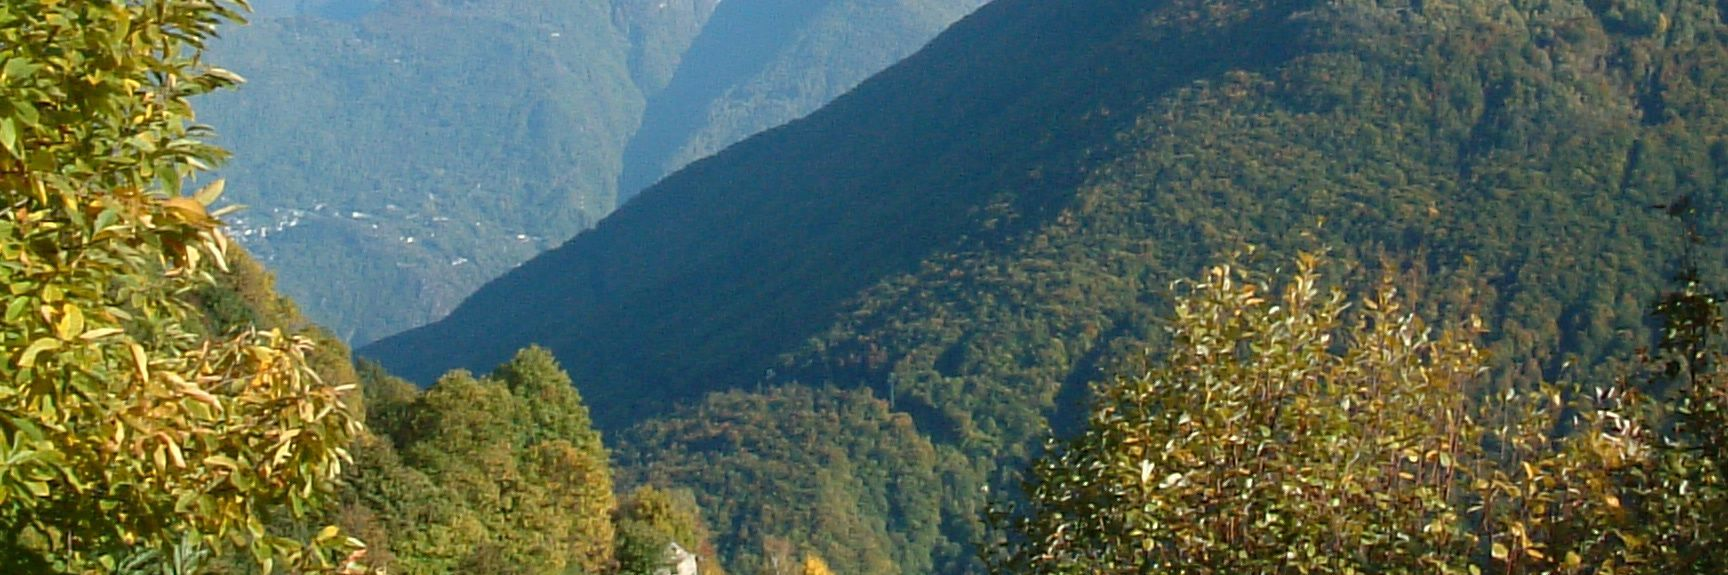 Valleggia, Verbano-Cusio-Ossola, Piedmont, Italy